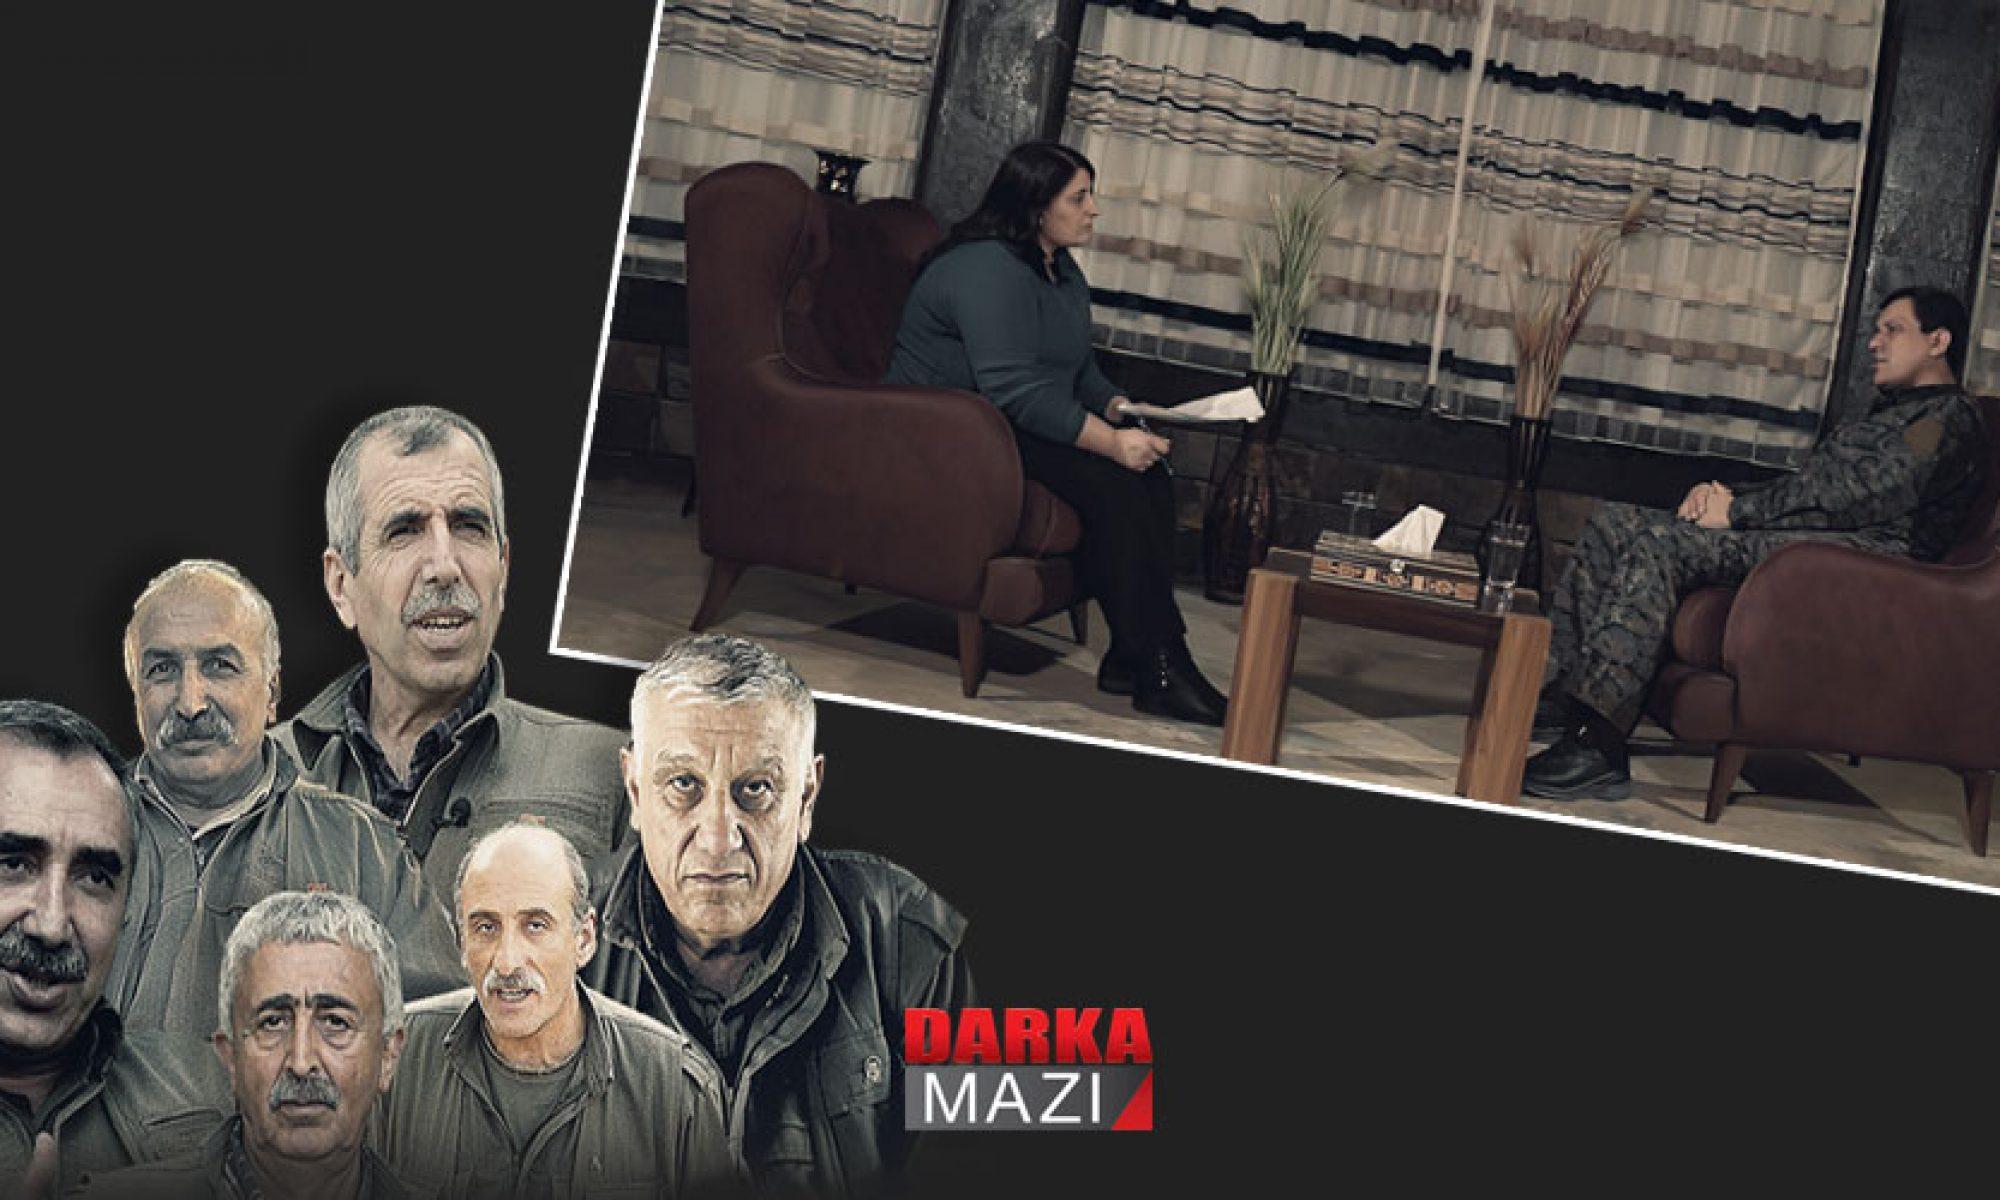 Mazlum Abdi'nin Hawar News'le imtihanı? Ronahi TV, Asya Abdullah, Fawza Yusıf, Zaxo Zagros, Bahoz Erdal, PKK, Mustafa Karasu, KCK, Kadro, Rojava, HSD,